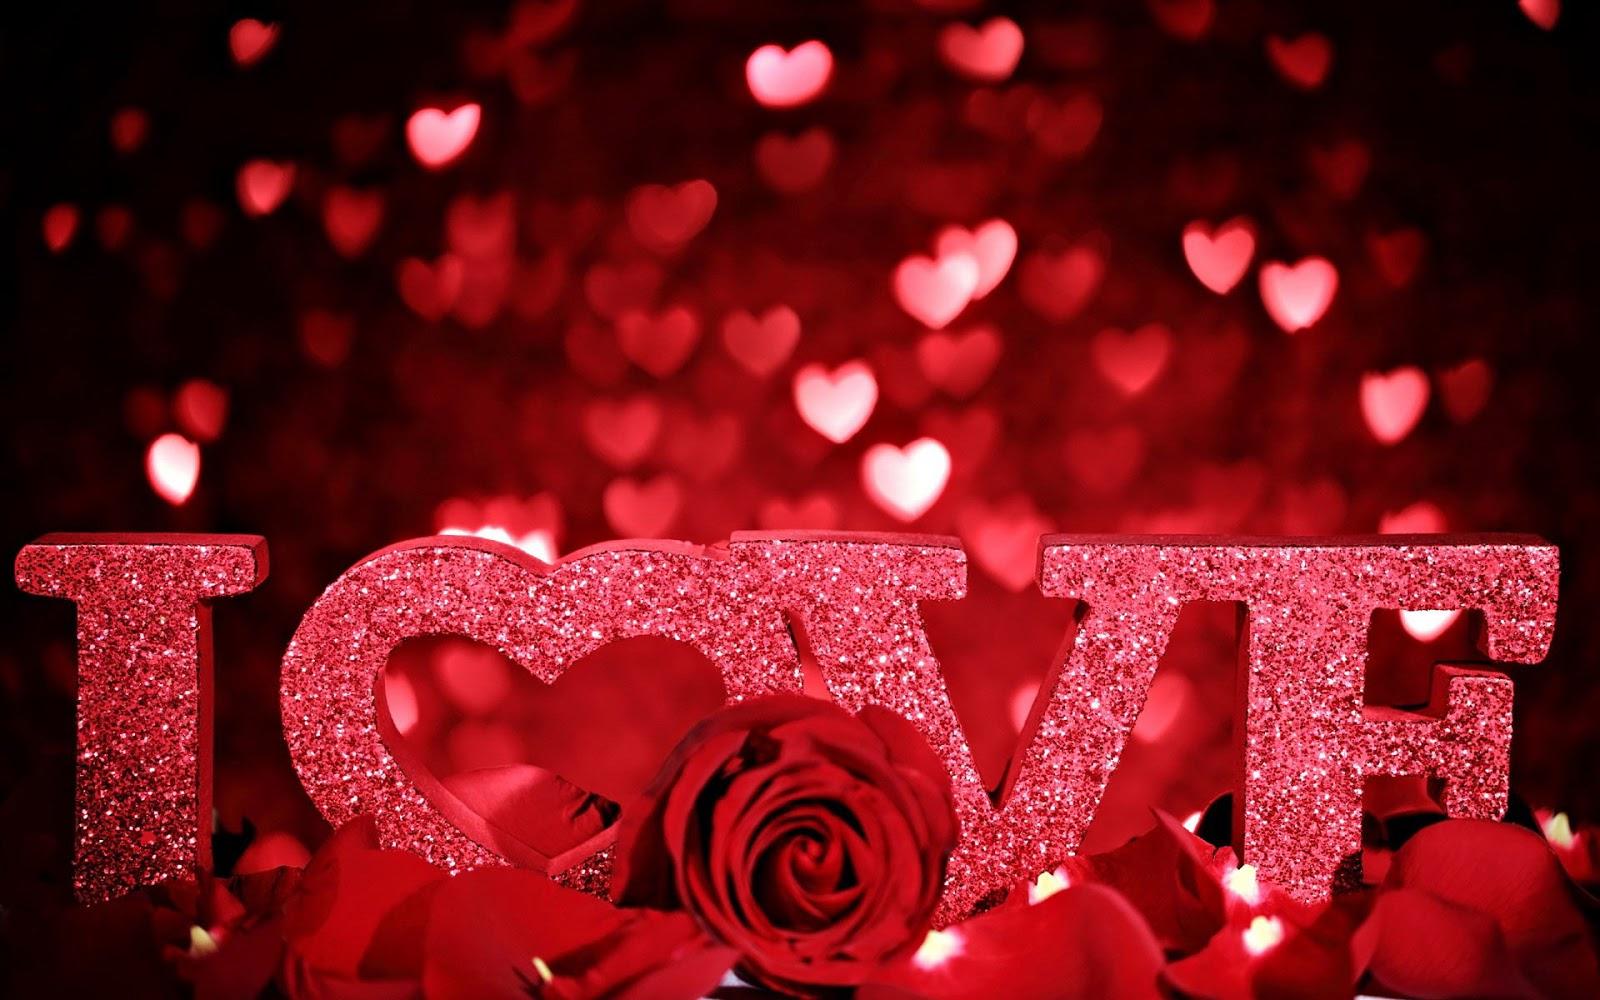 بالصور تحميل صور حب , صور رومانسيه وحب 3197 6